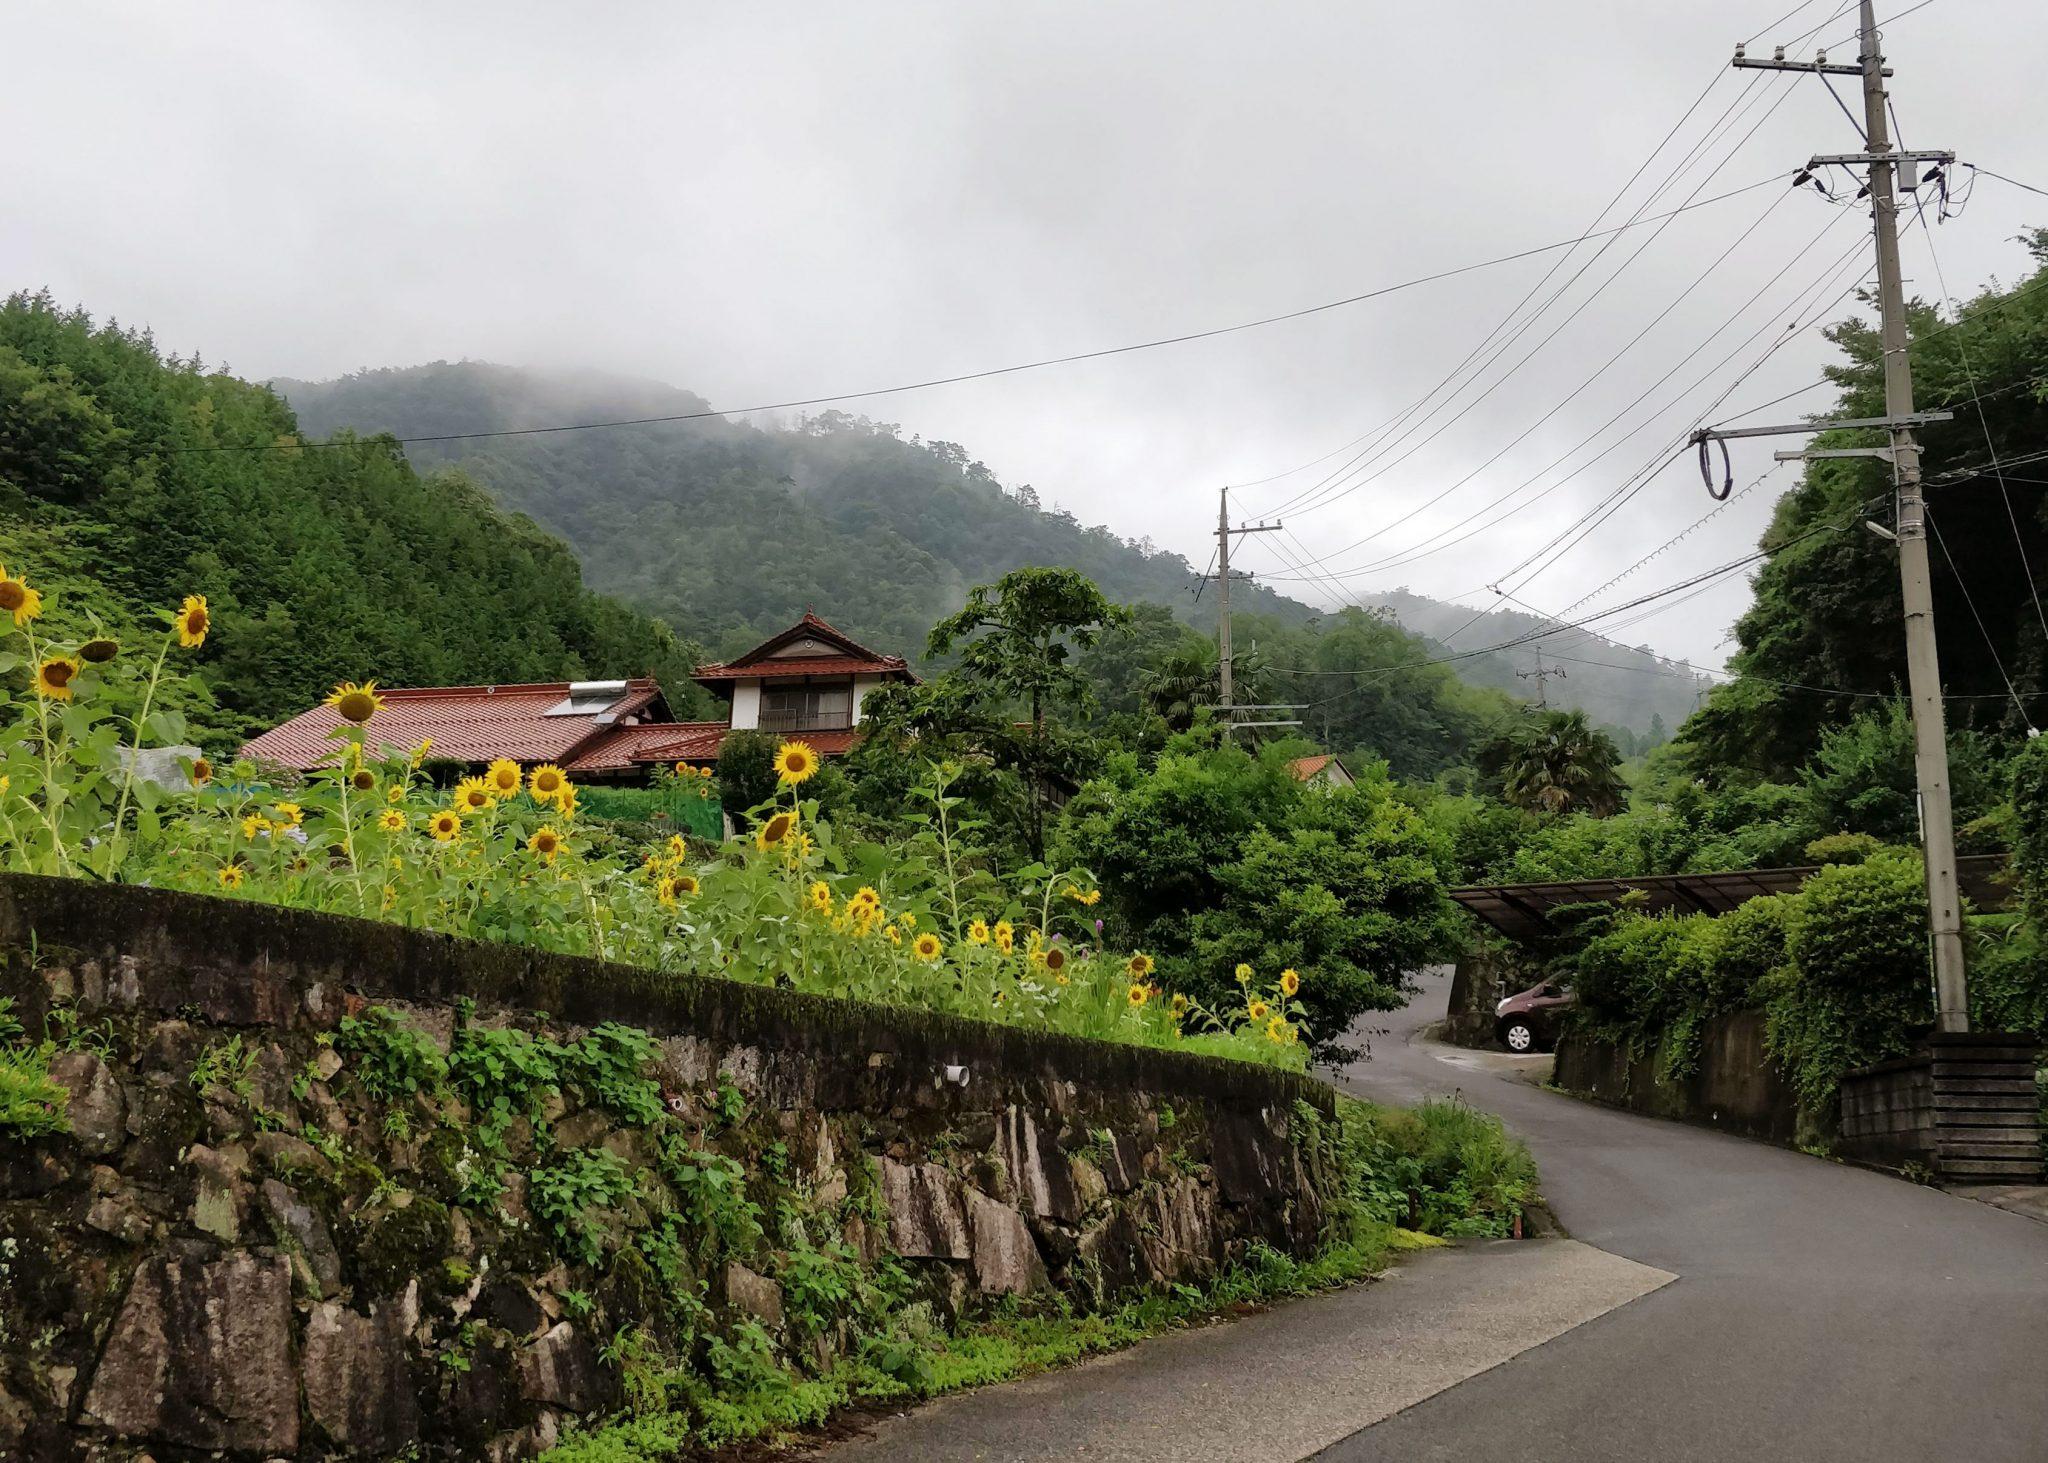 Katu Japanin maaseudulla